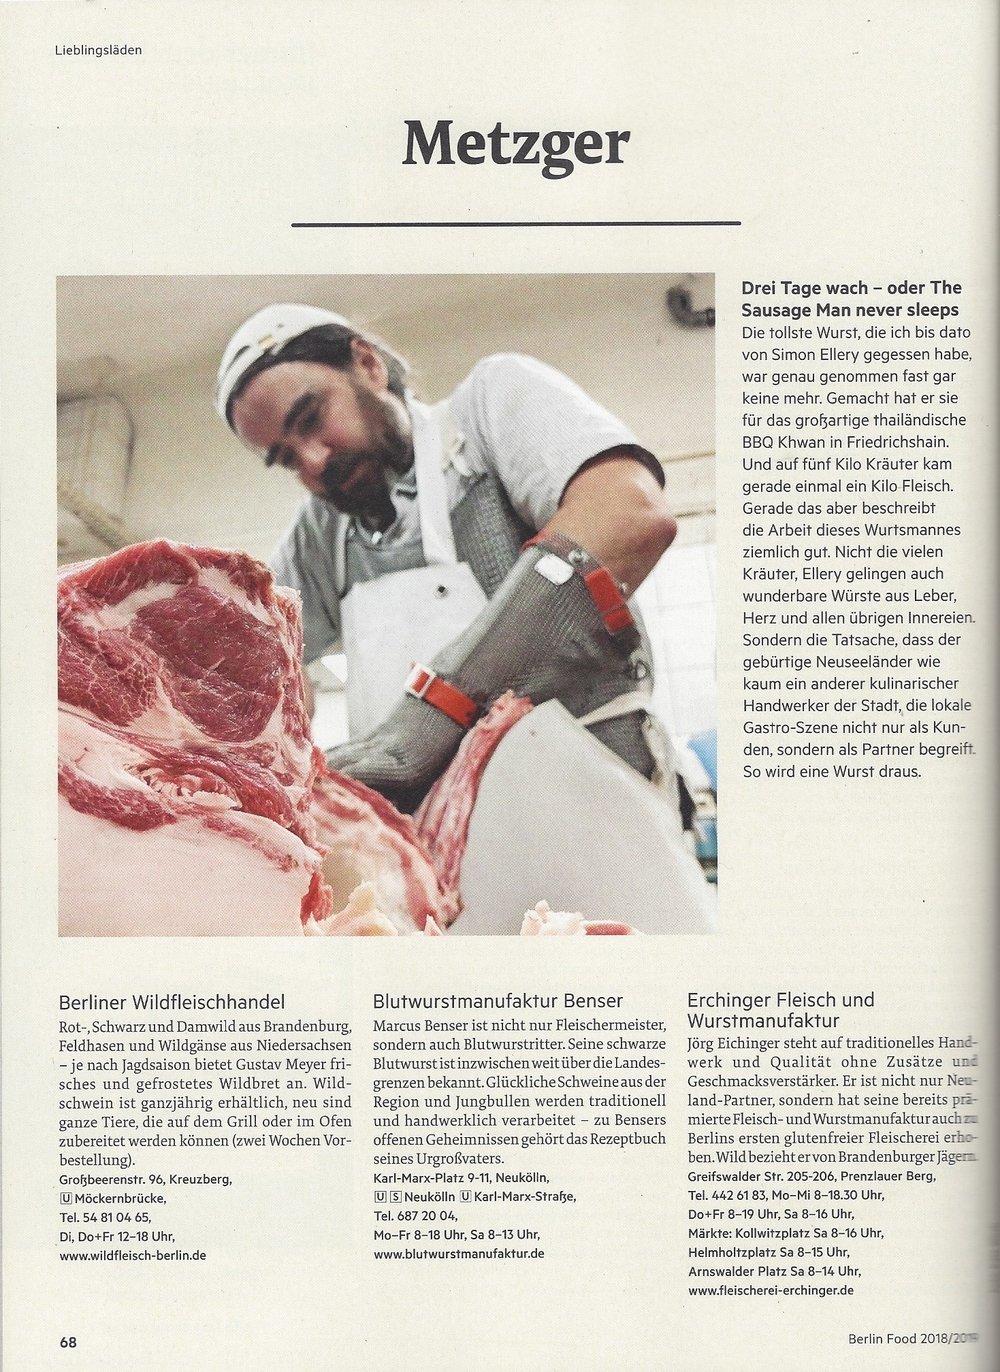 The Sausage Man Never Sleeps Simon Ellery in Berlin Food 2018/19 Magazine